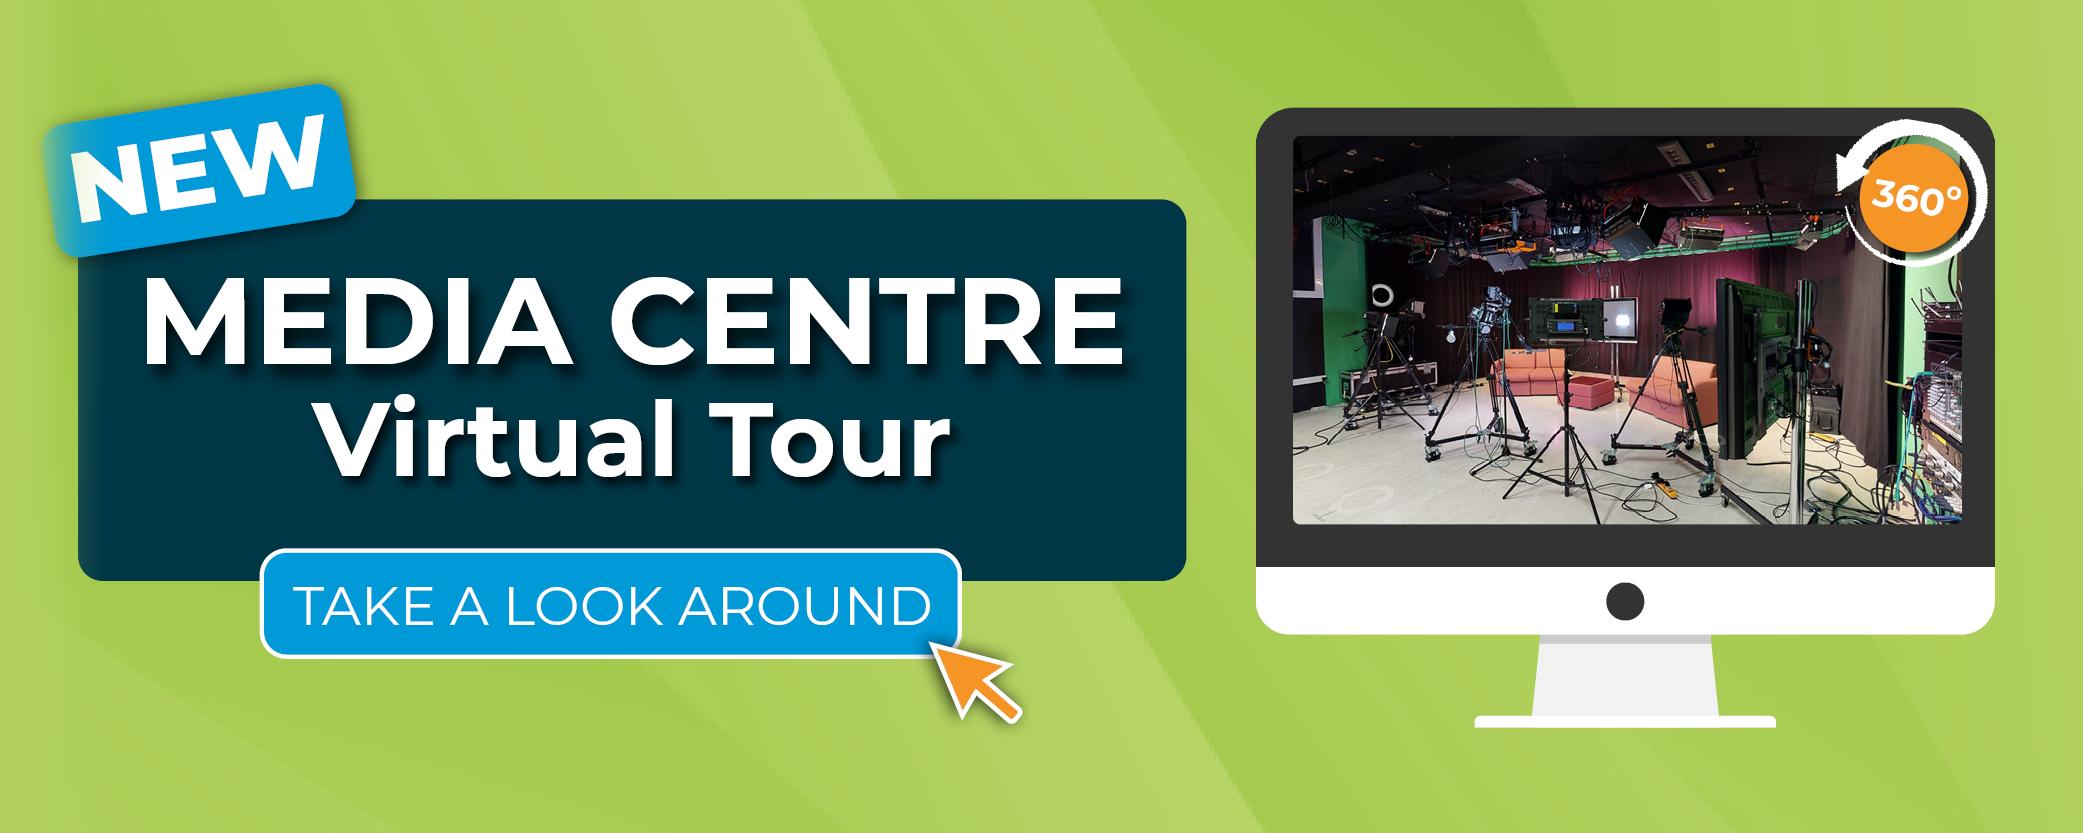 NEW - Media Centre Virtual Tour - take a look around